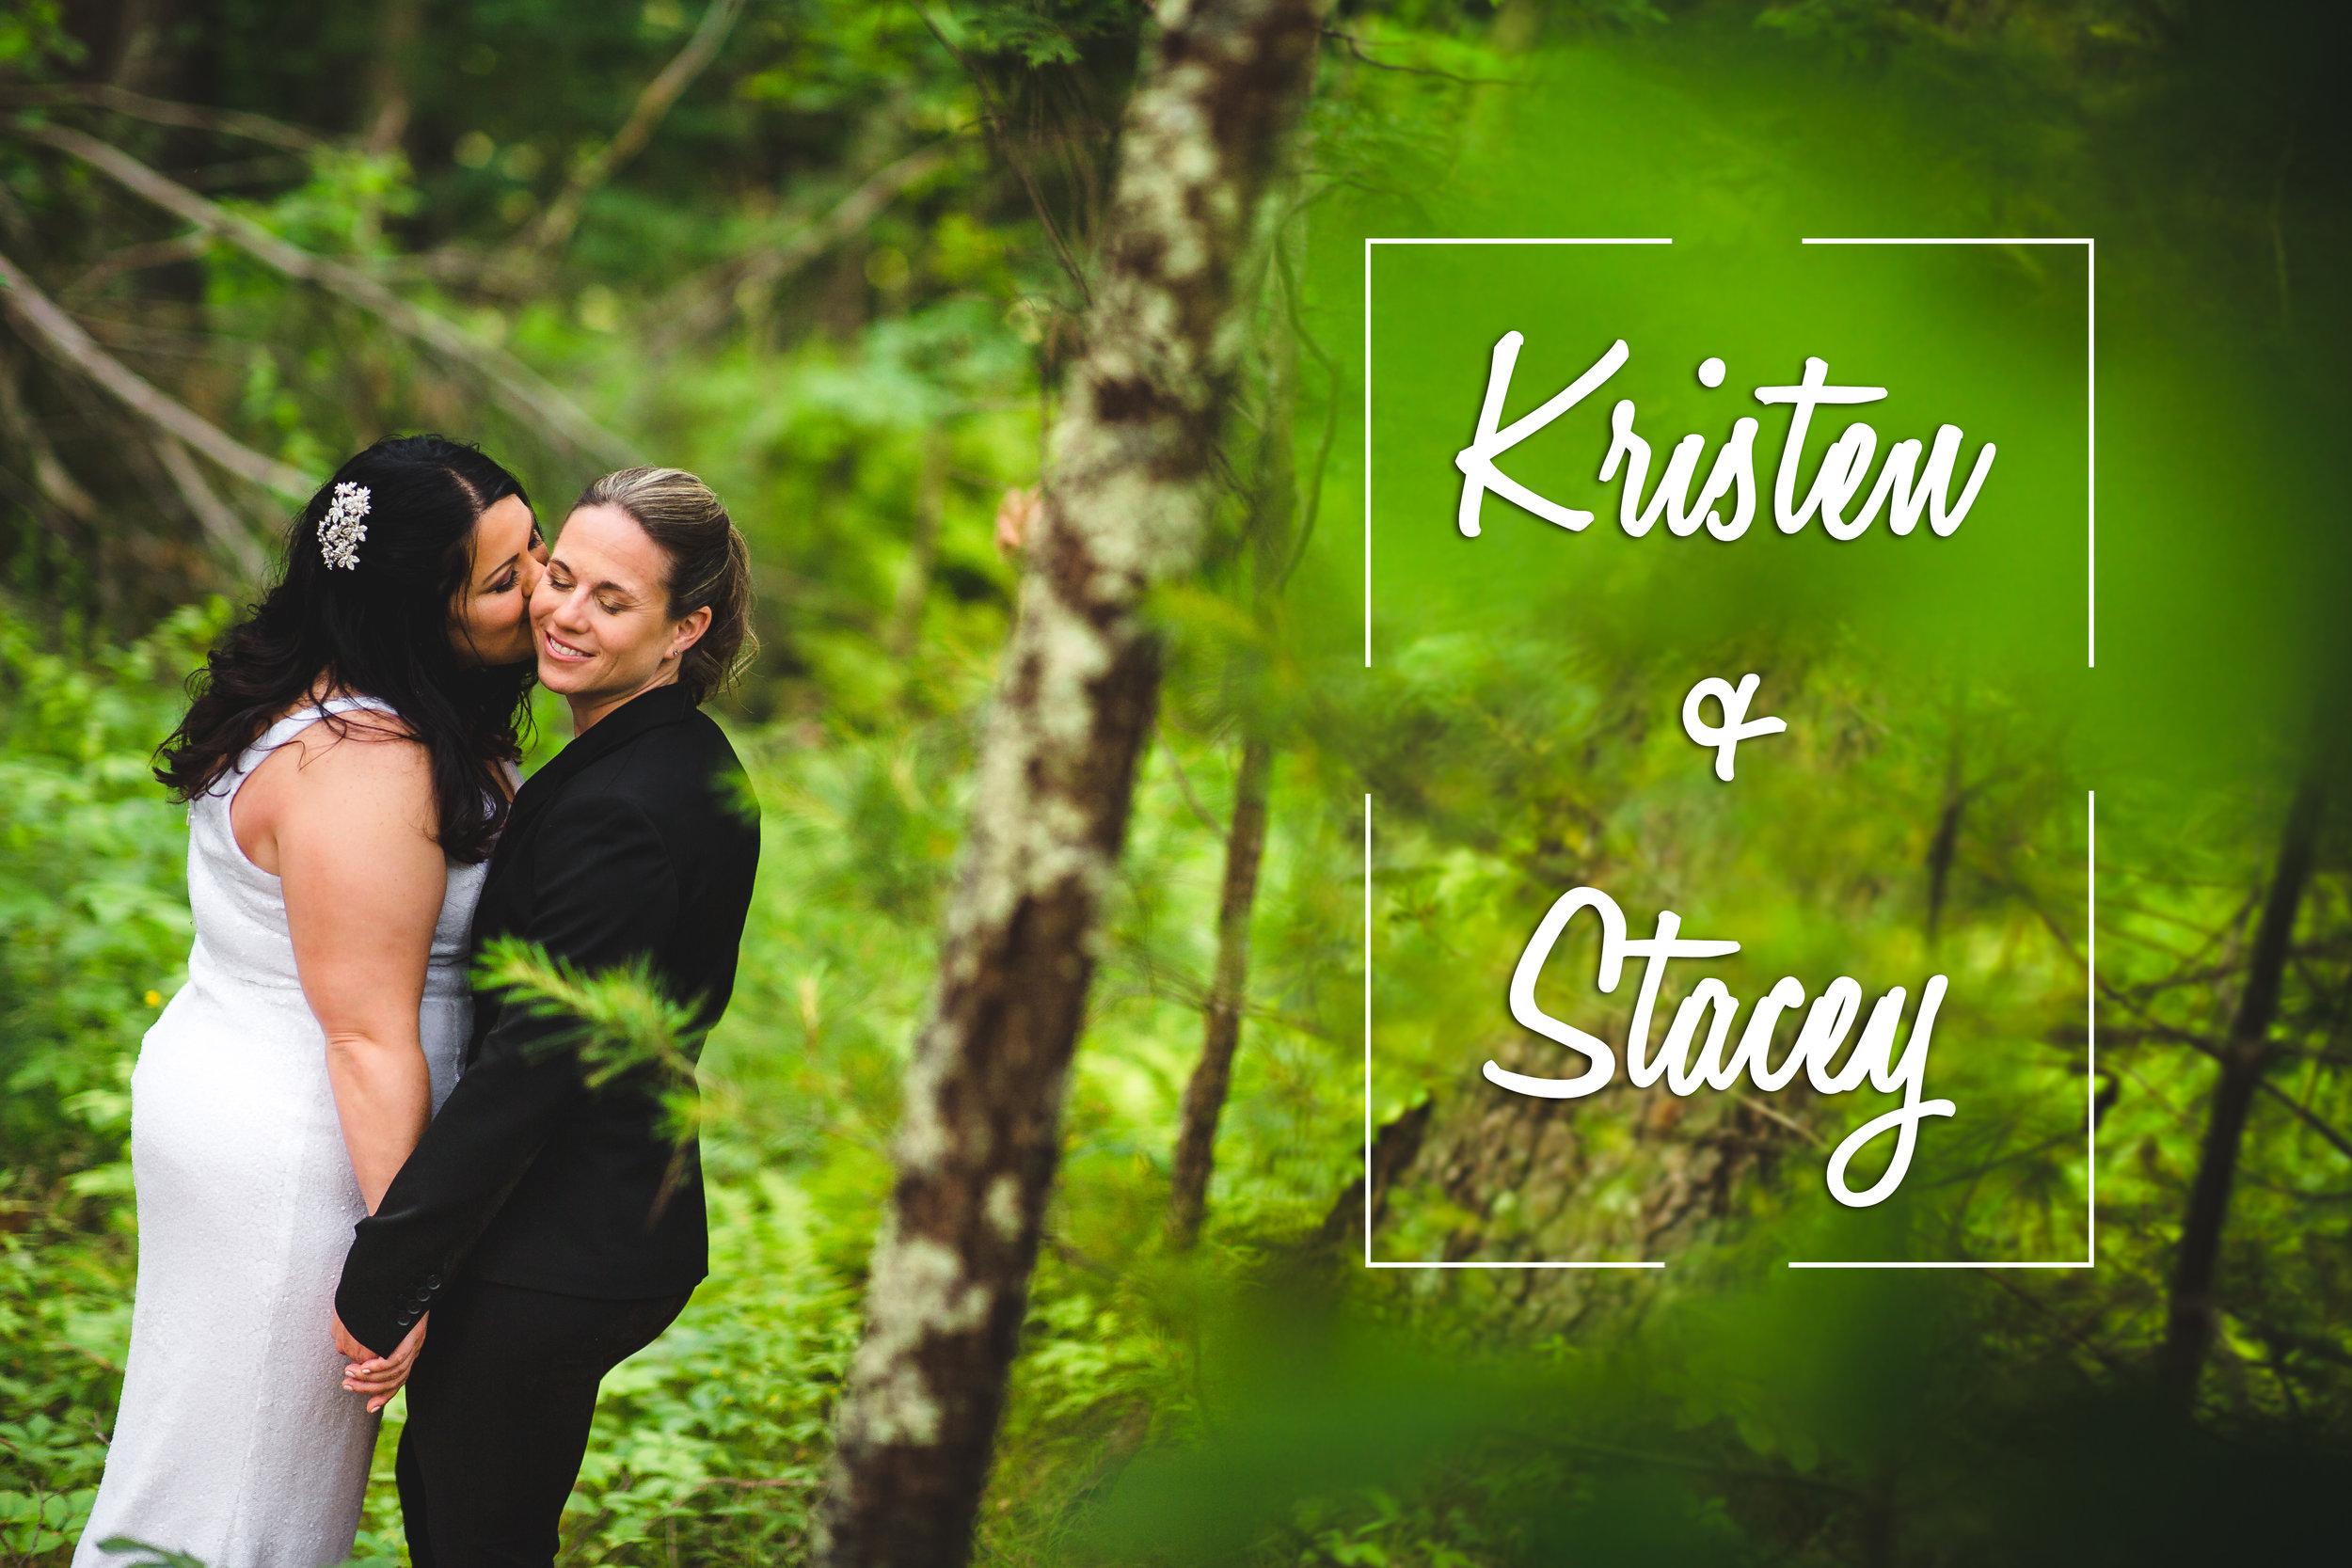 1025-Kristen&Stacey_nlogcouplessession-DC6B0152.jpg